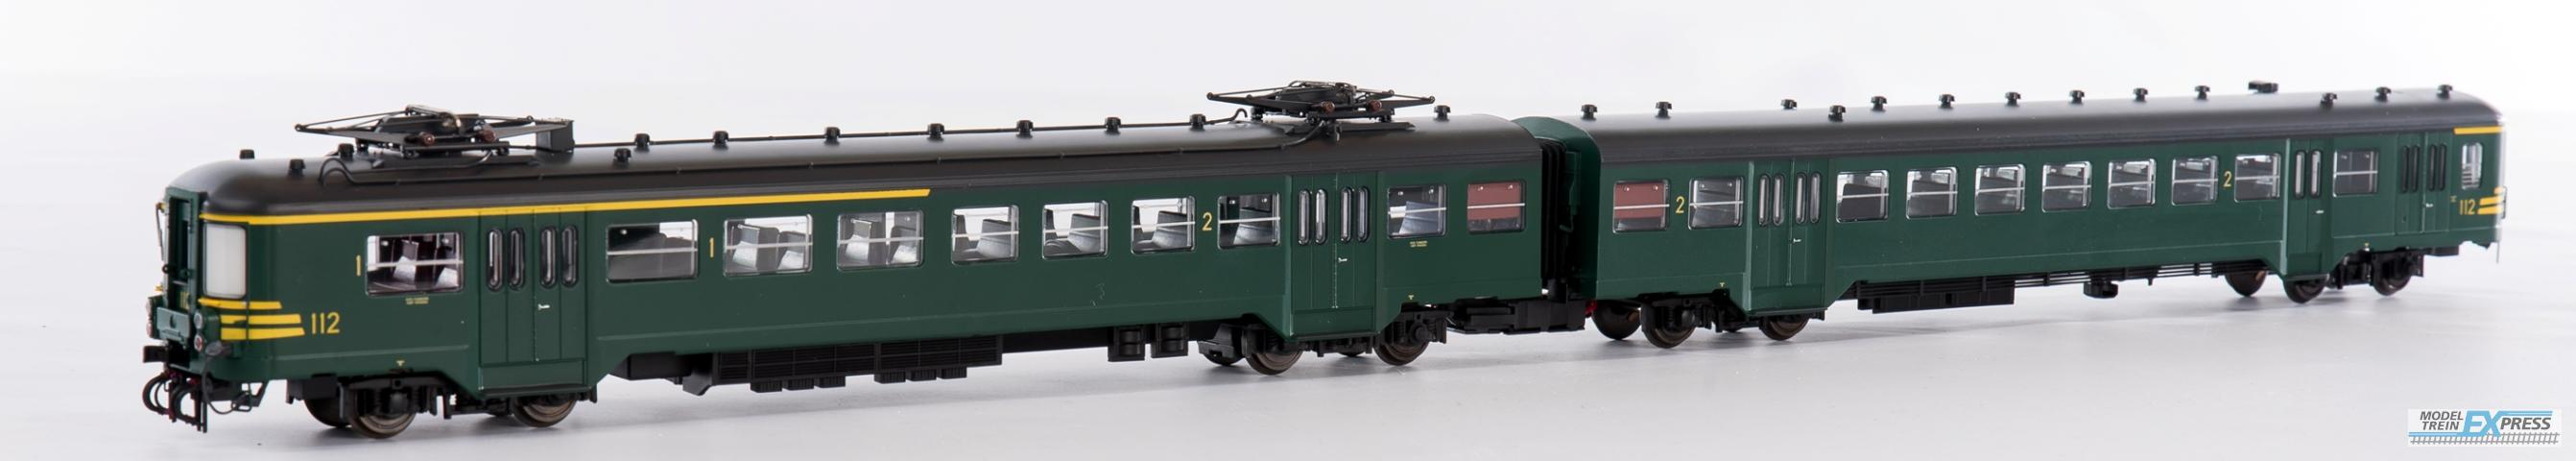 B-Models 7002.01L